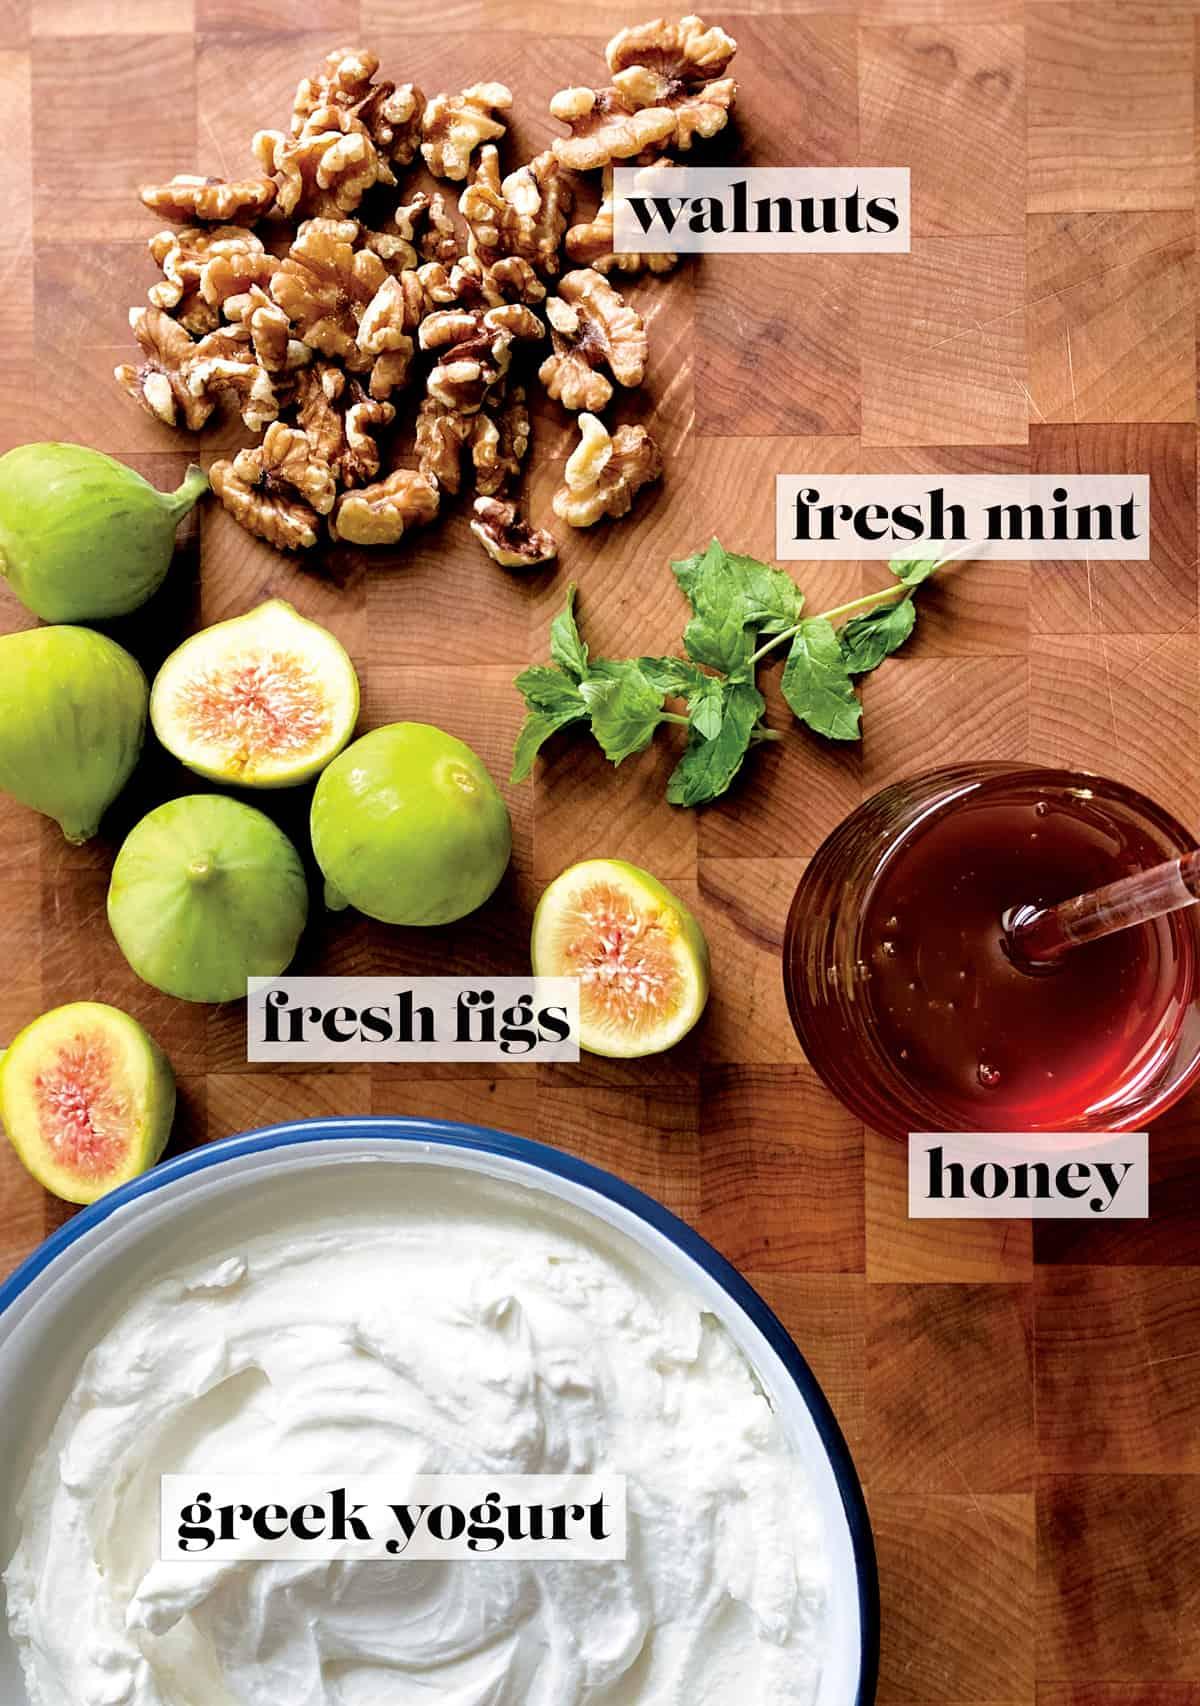 Fresh figs, walnuts, two fresh mint twigs, a pot of honey and a bowl of yogurt on a butcher block.